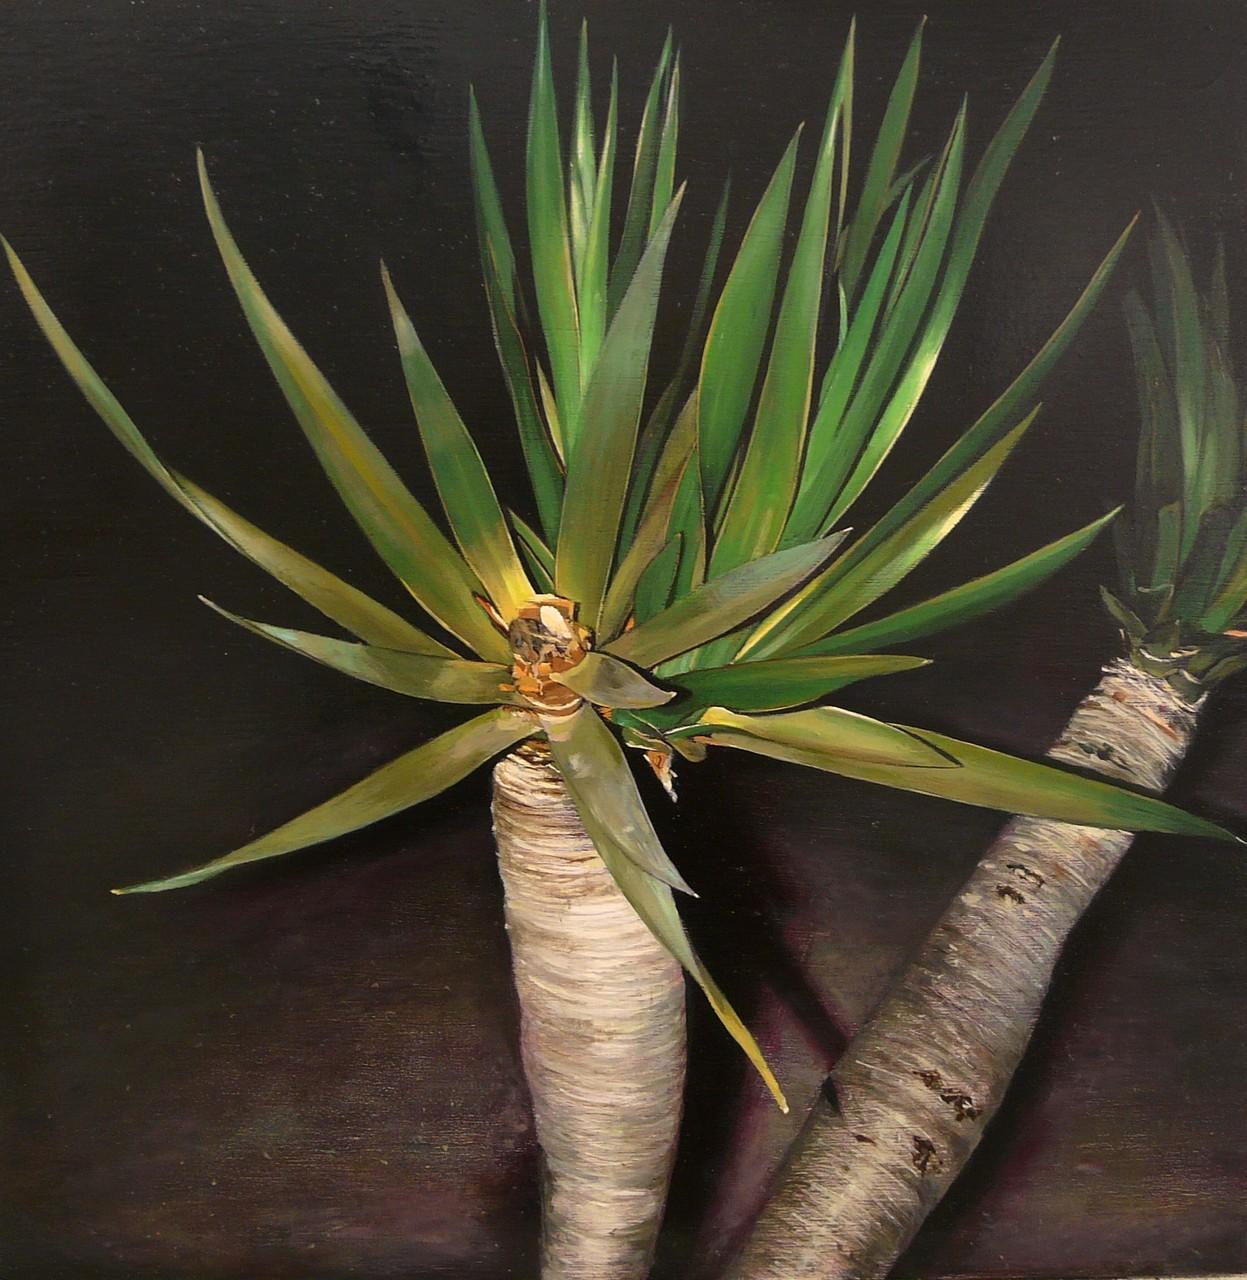 Palmera de noche, 40x40 cm